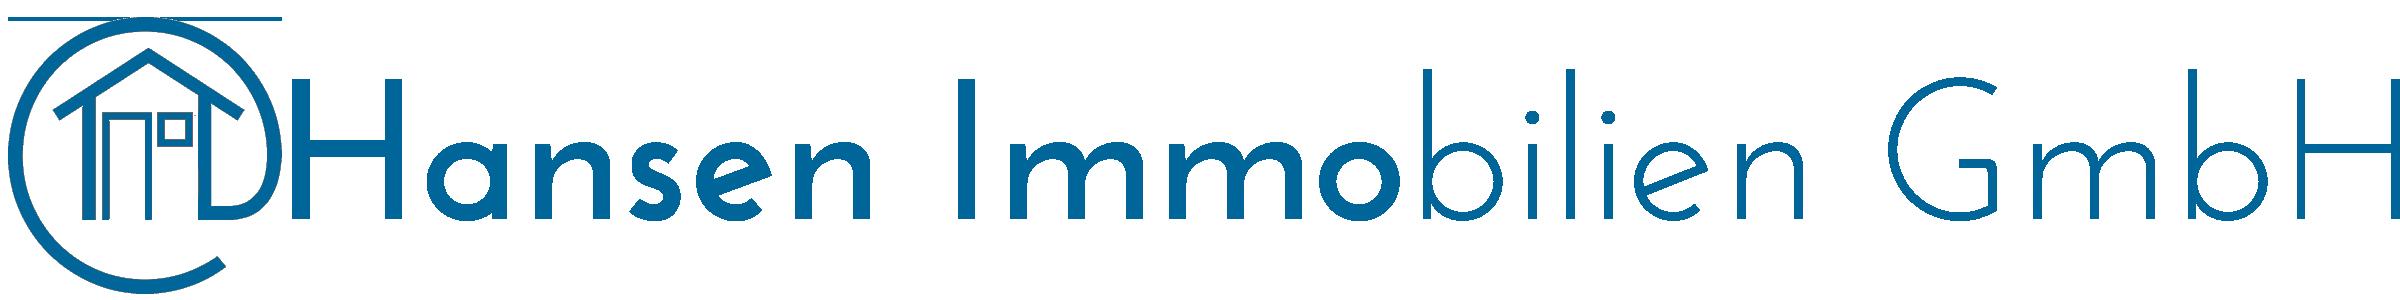 hansen Immobilien GmbH